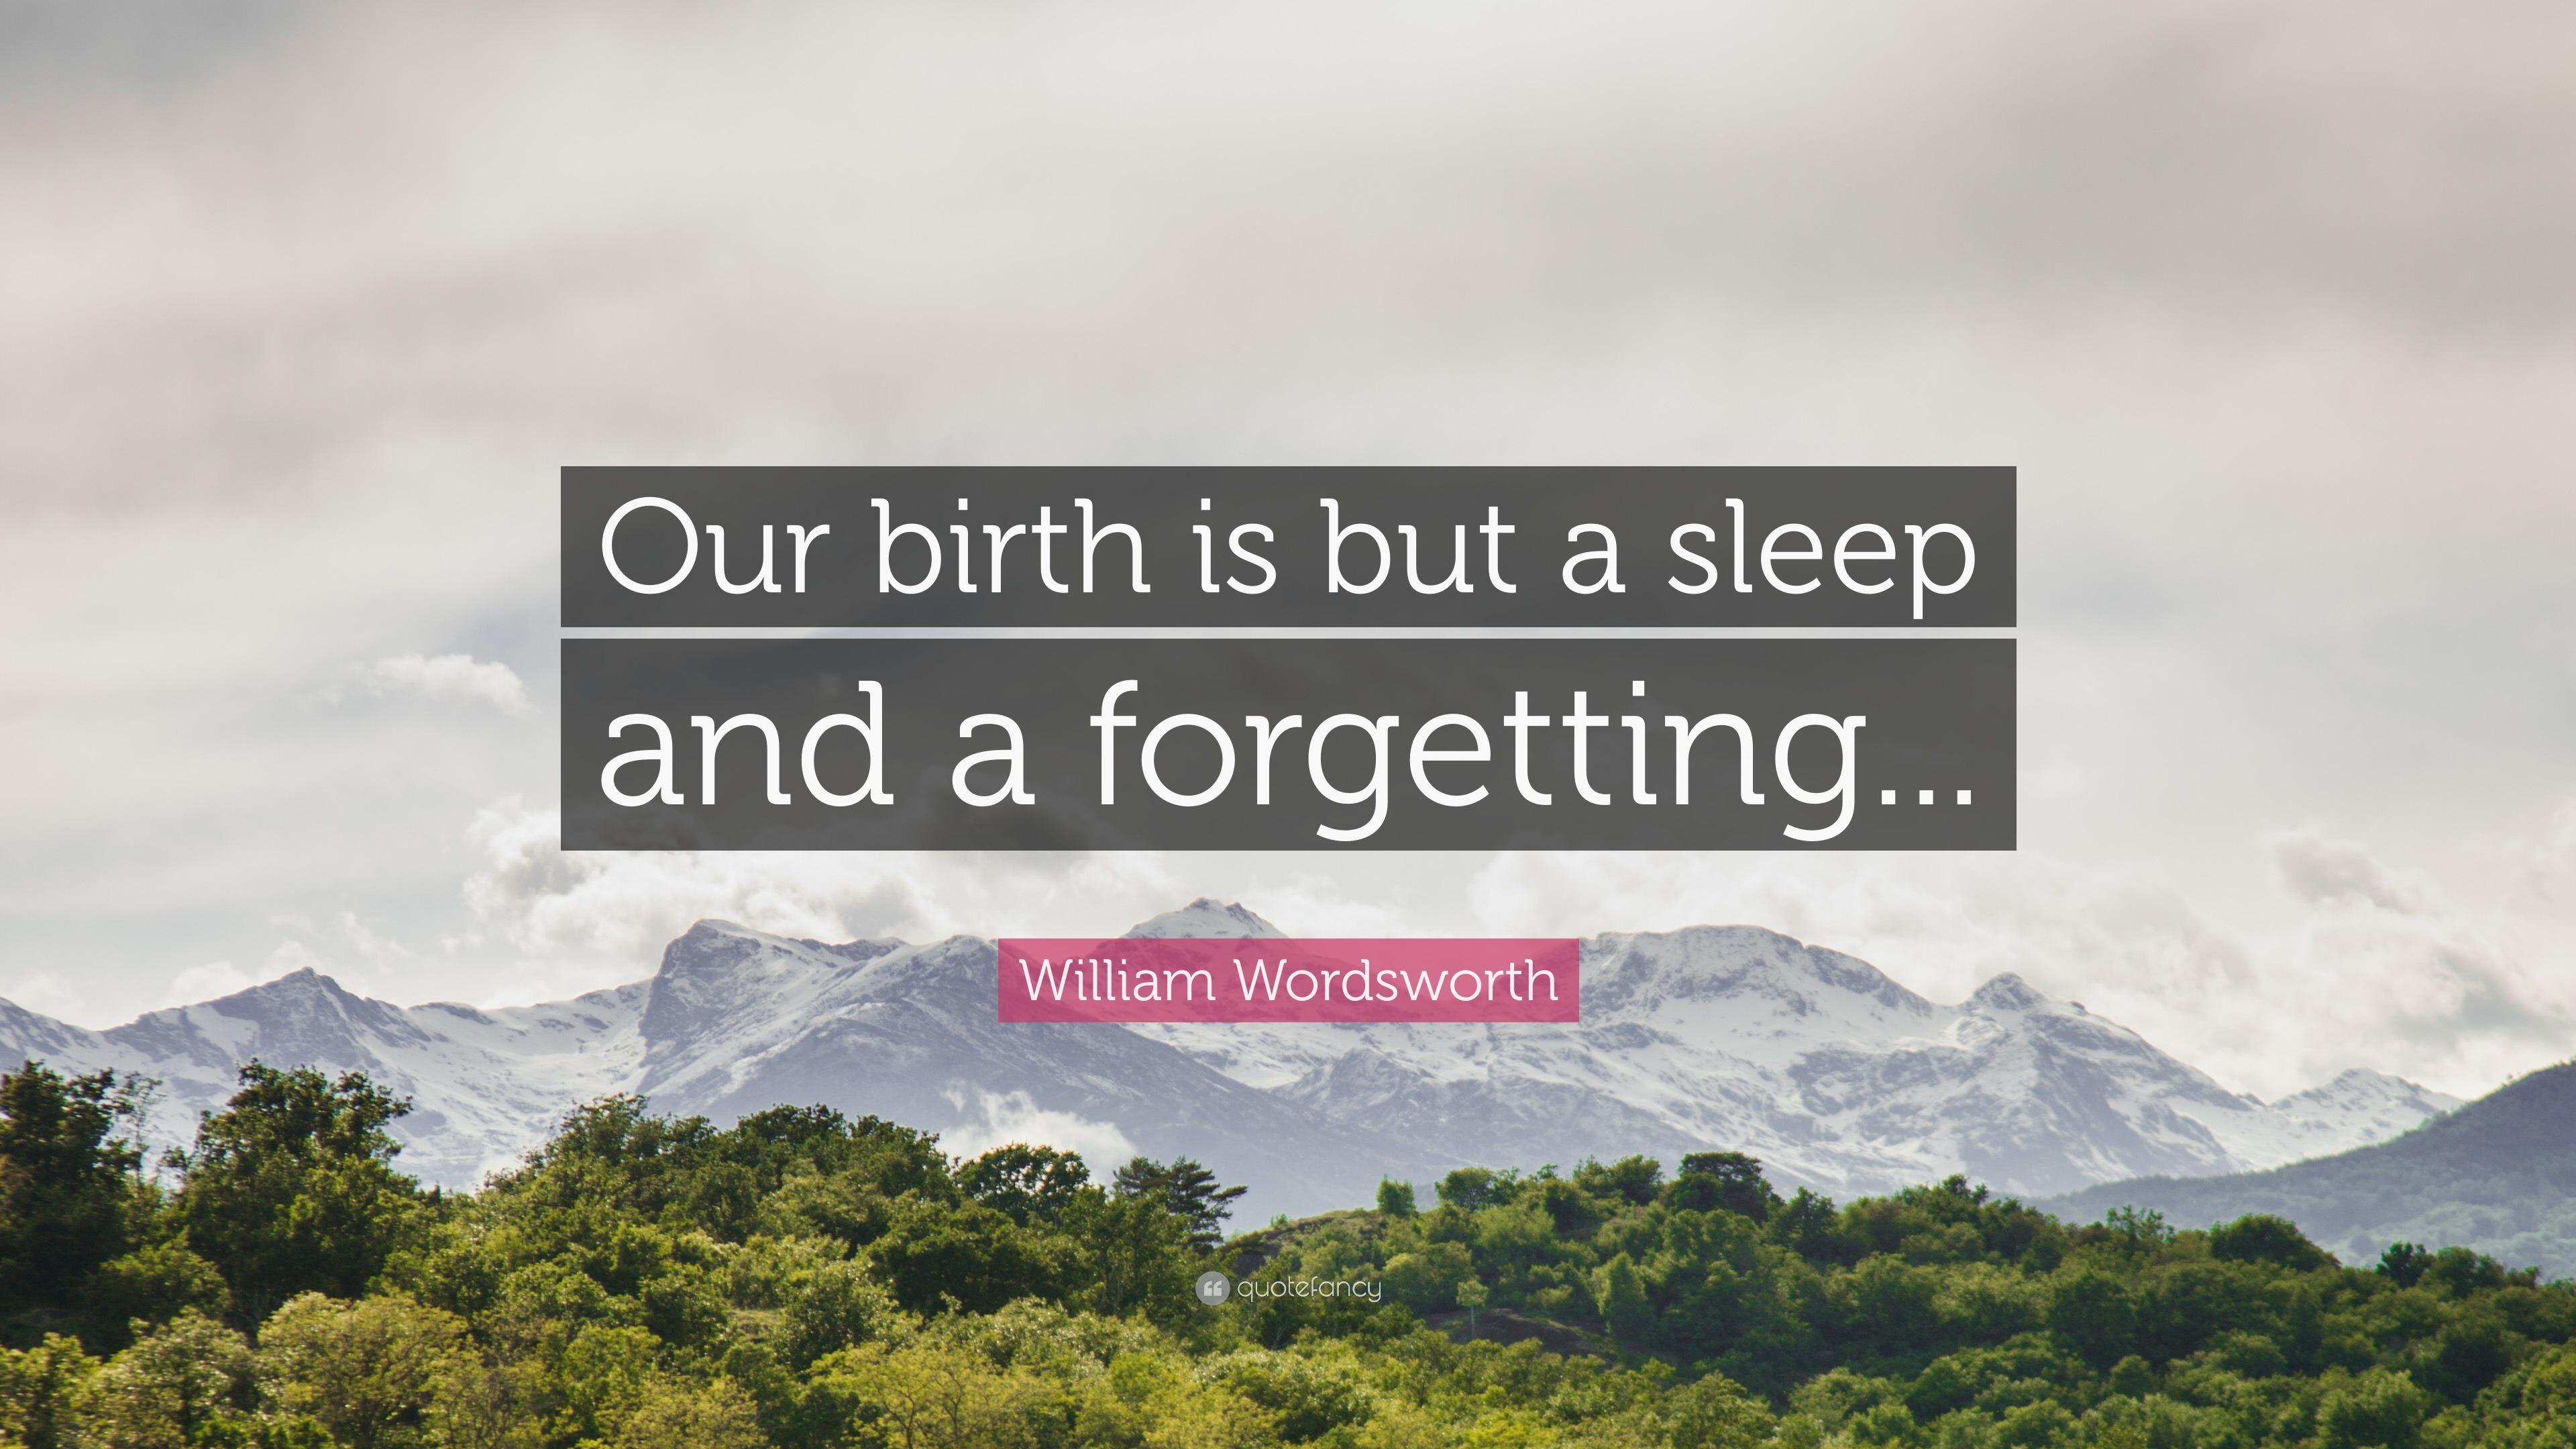 william wordsworth to sleep